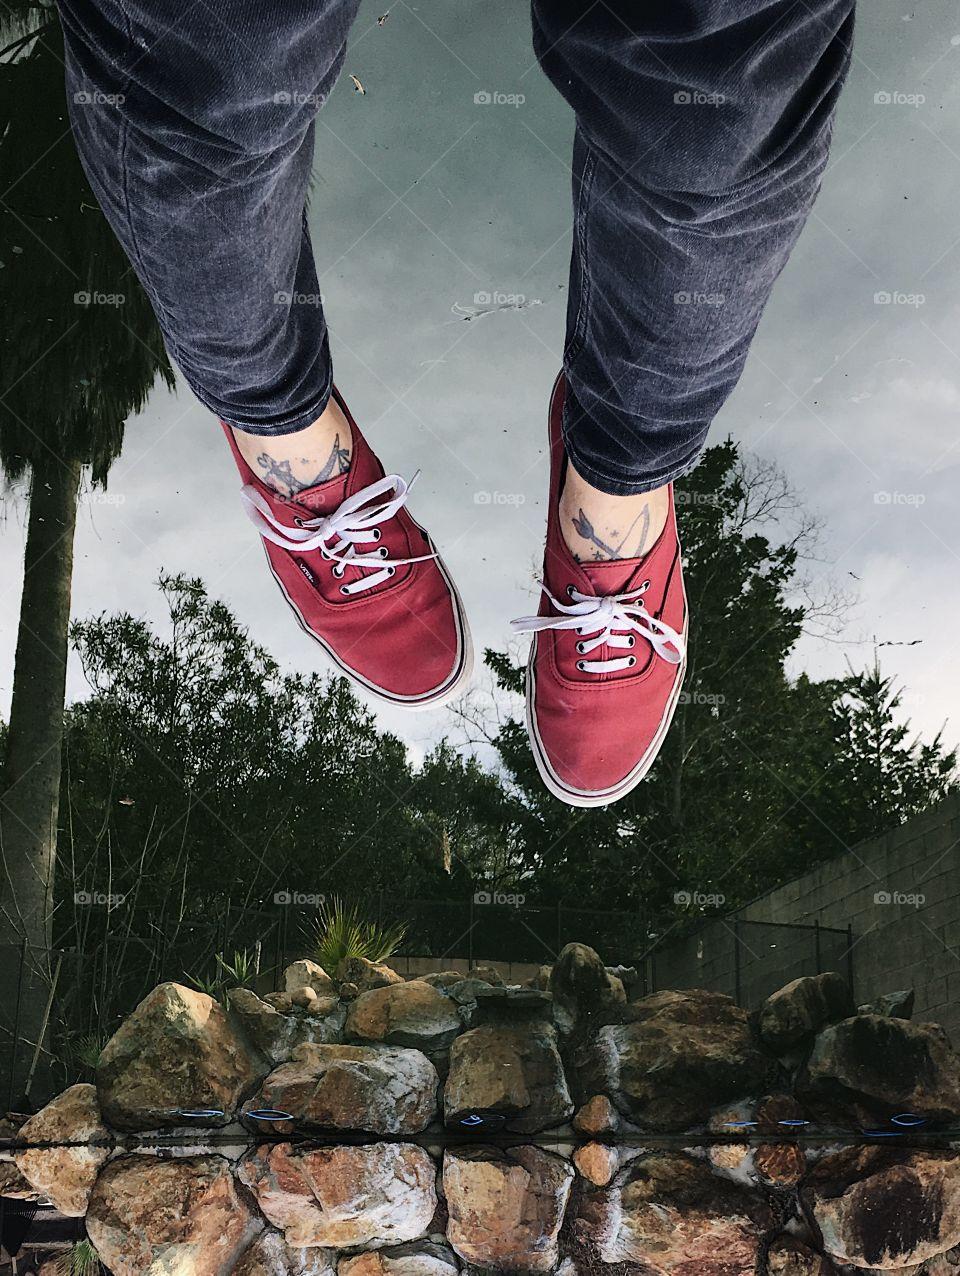 Feet over water.